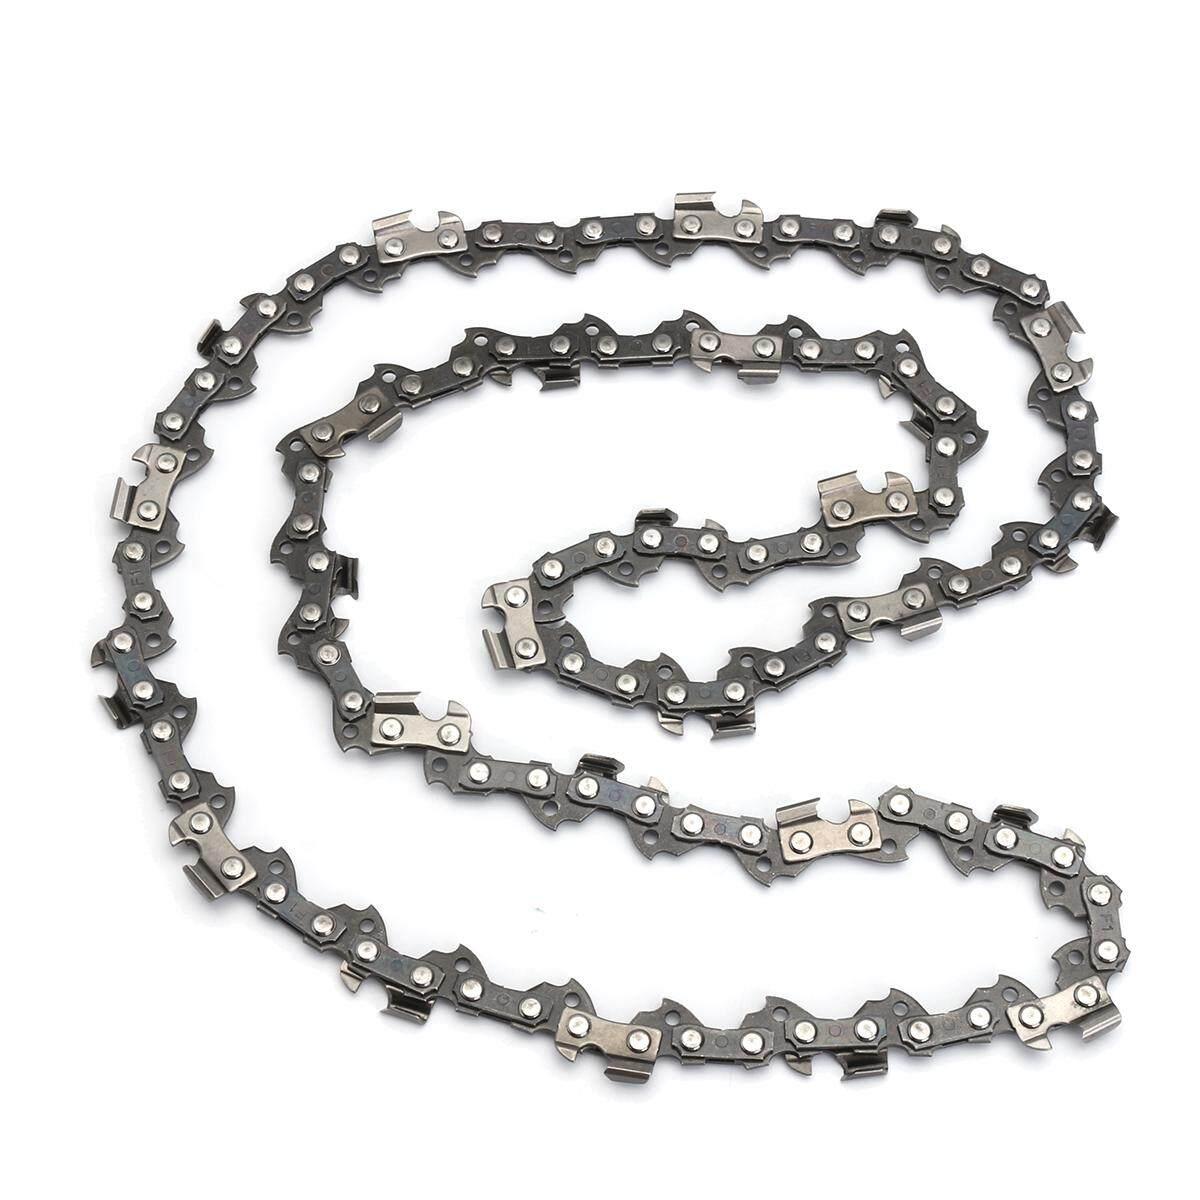 1x Chainsaw Semi Chisel Chains 3/8LP 043 55DL Stihl 16 Bar MS170 MS171 MS180